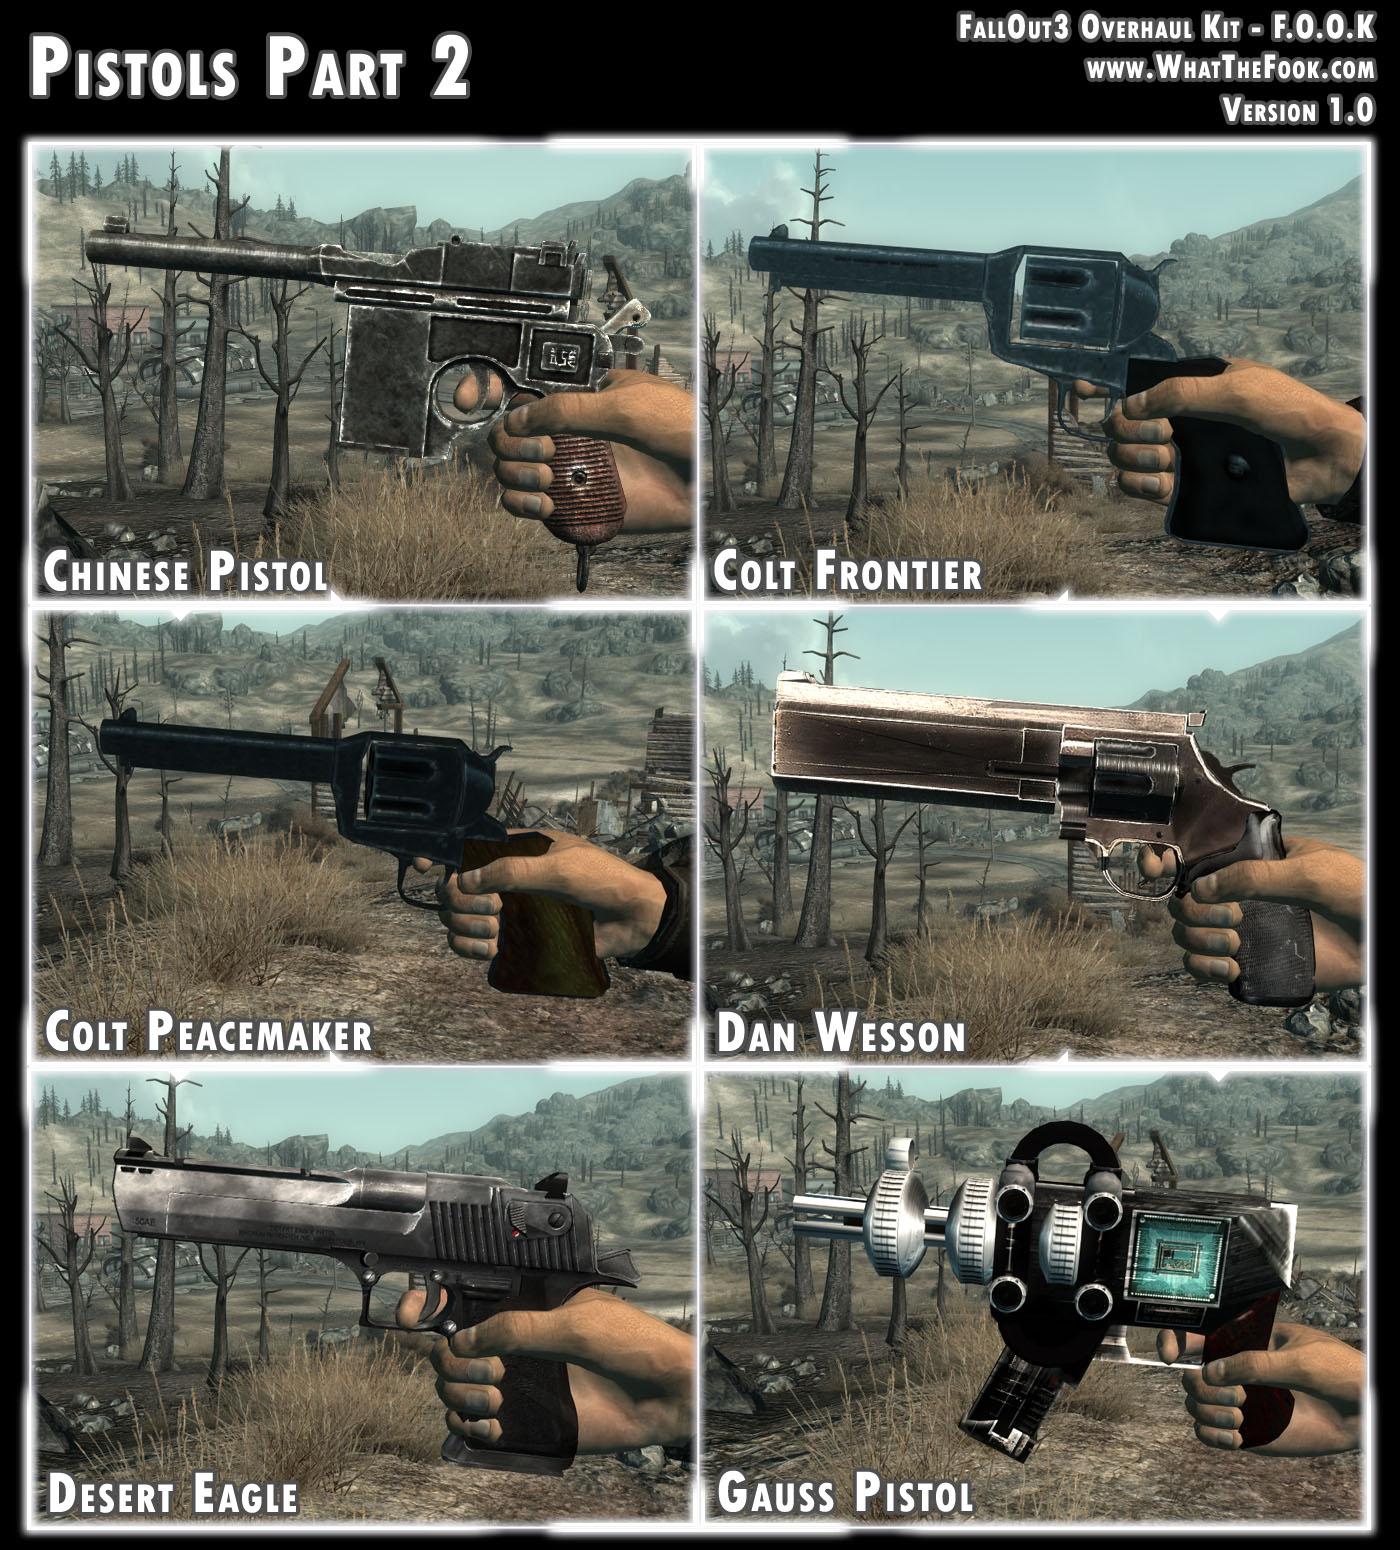 fallout 3 fook 2